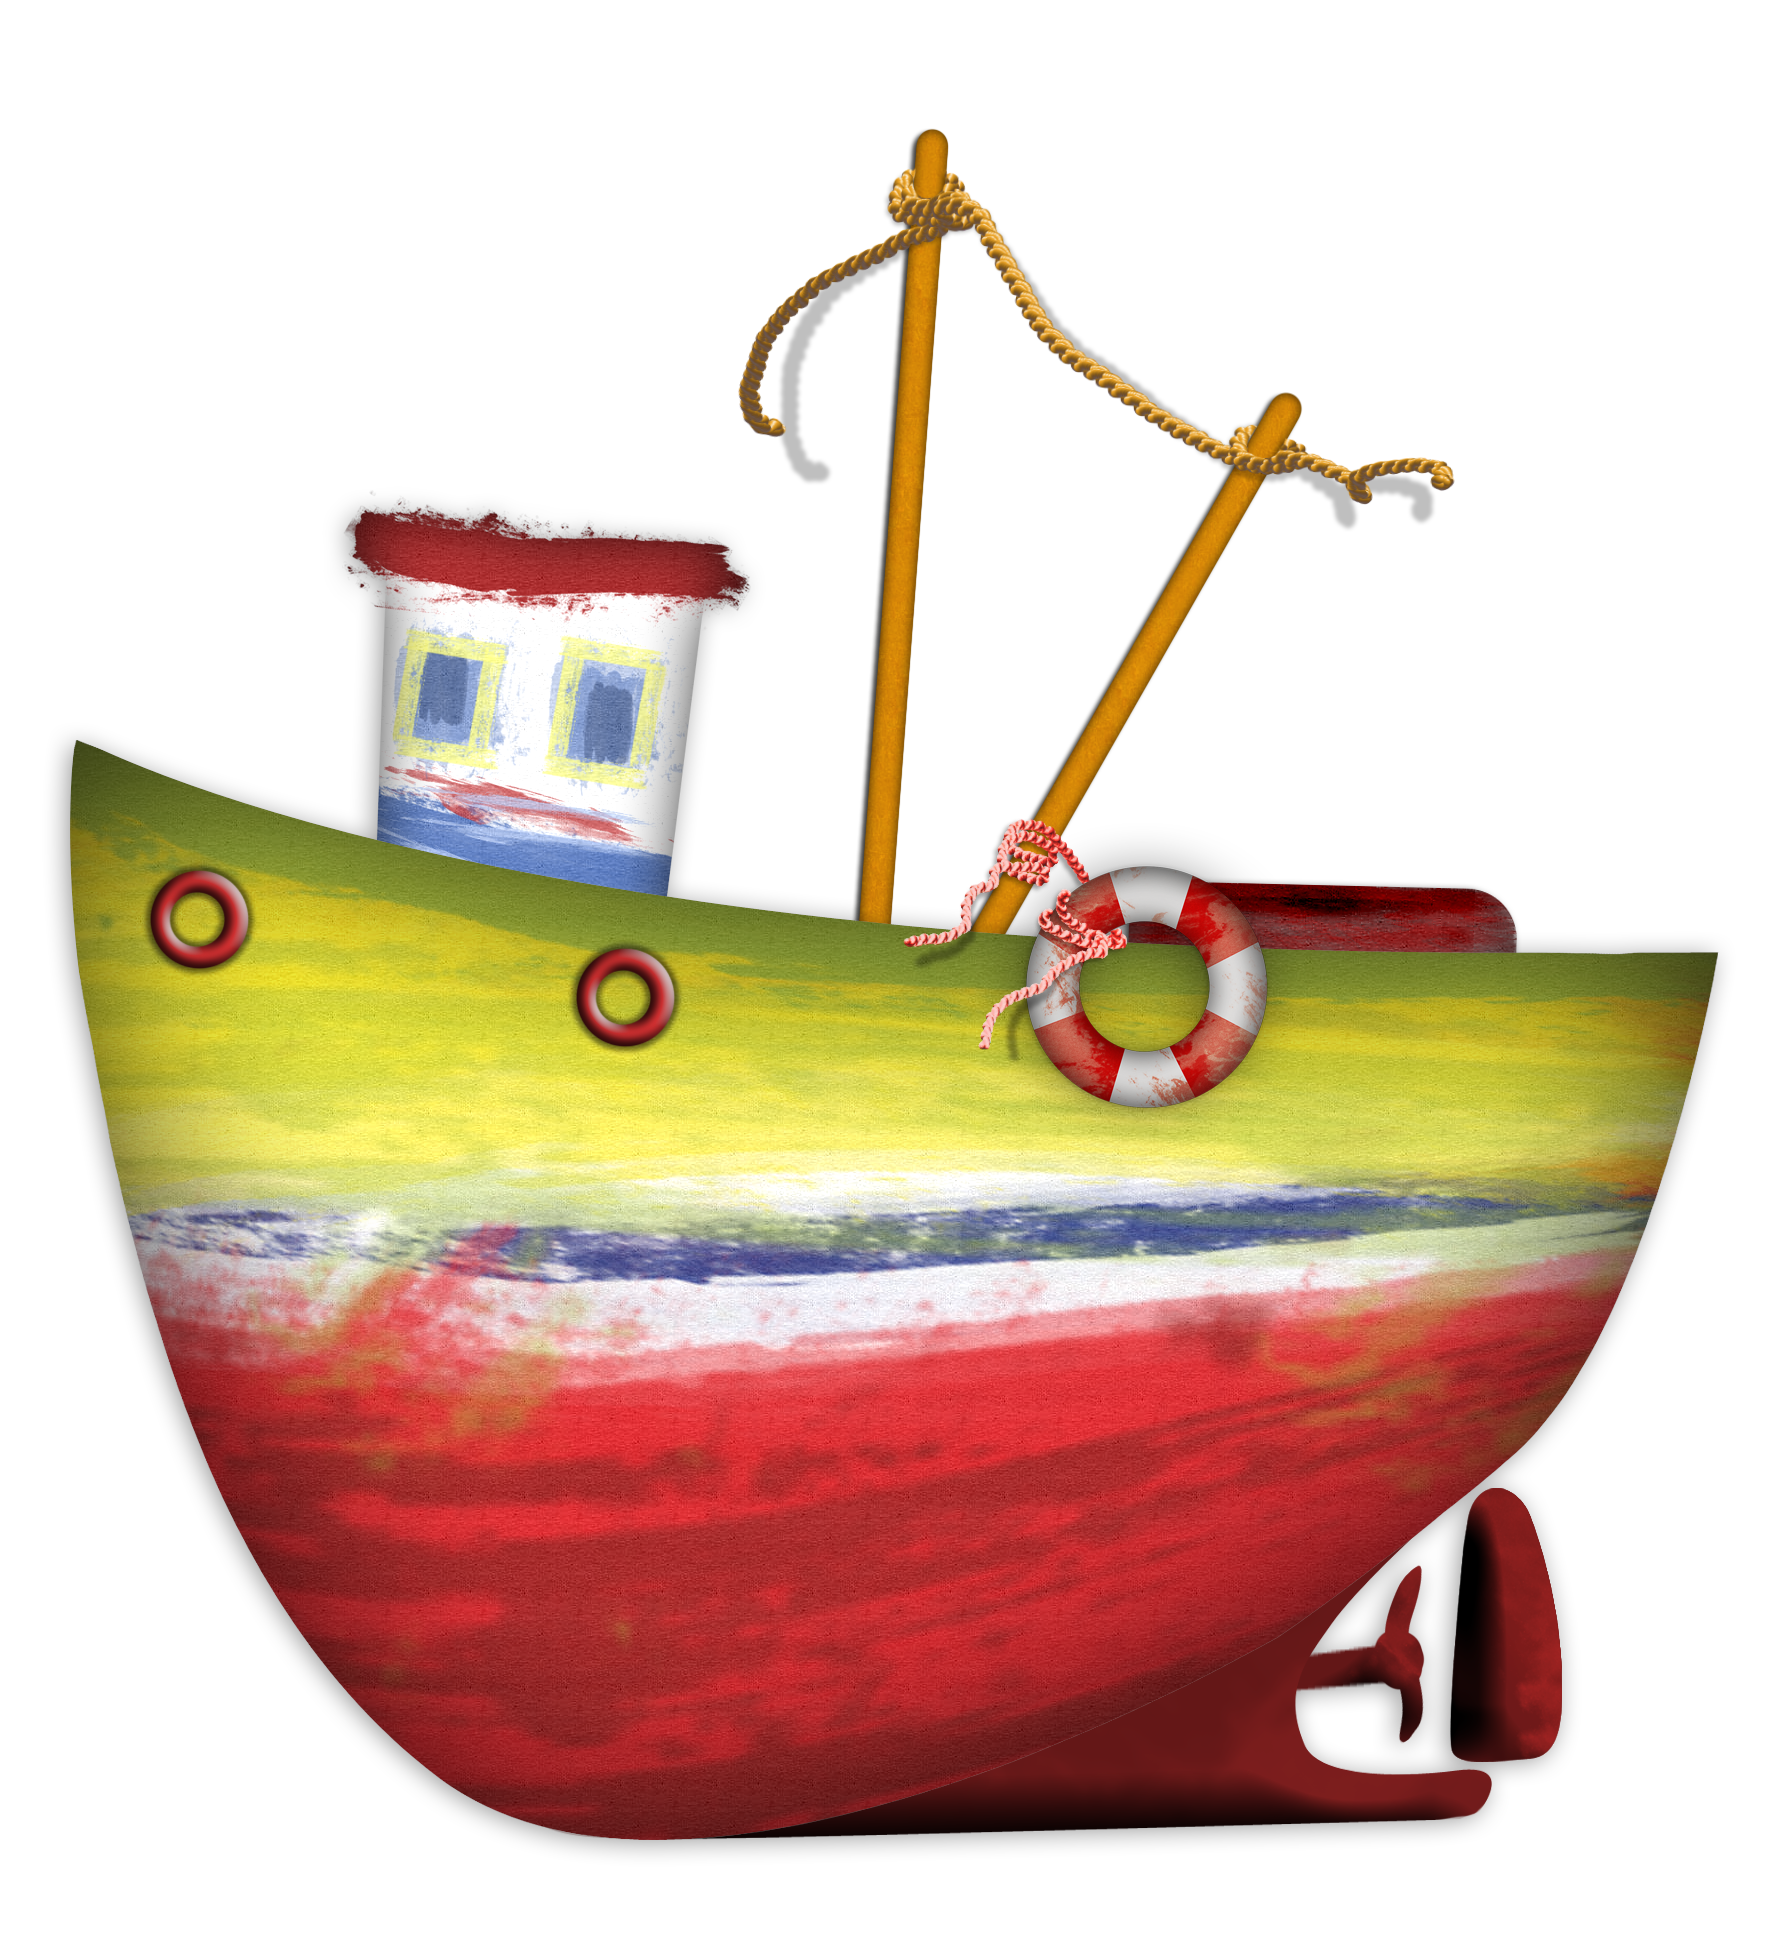 Im genes infantiles barco de pesca - Imagenes de barcos infantiles ...